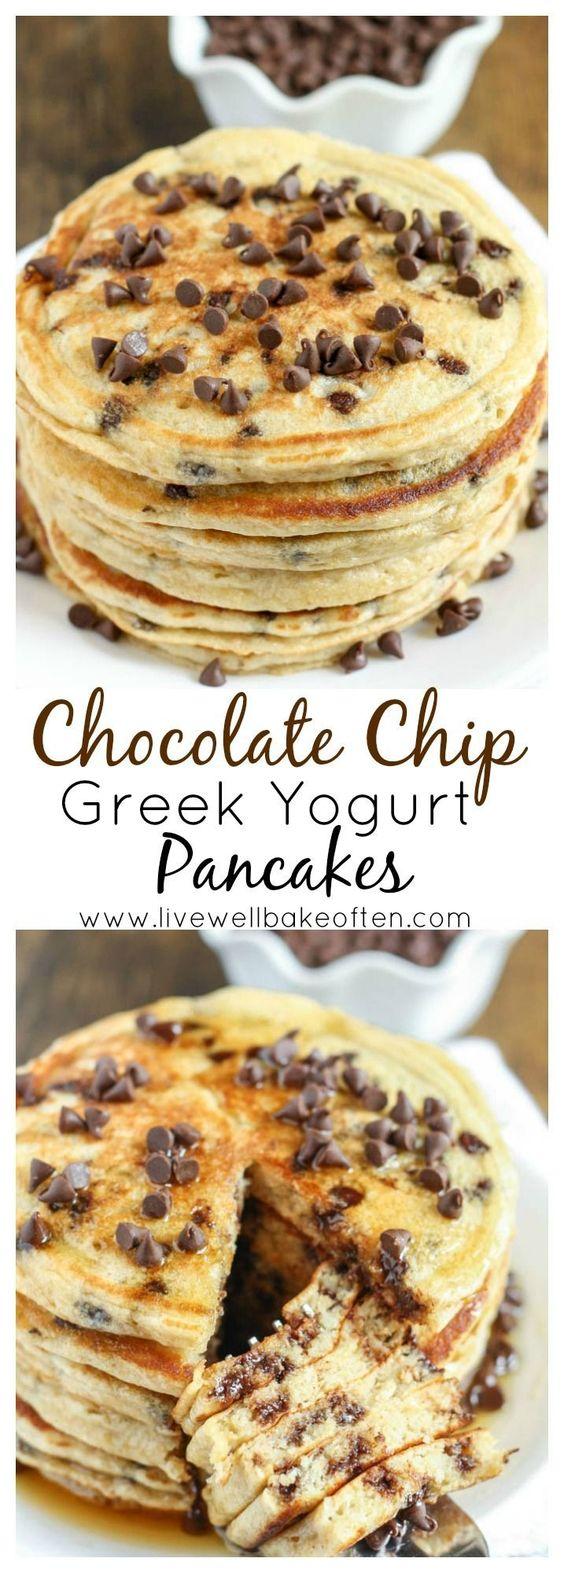 CHOCOLATE CHIP GREEK YOGURT PANCAKES #chocolate #chocolatechip #greek #yogurt #pancakase #breakfast #breakfastrecipes